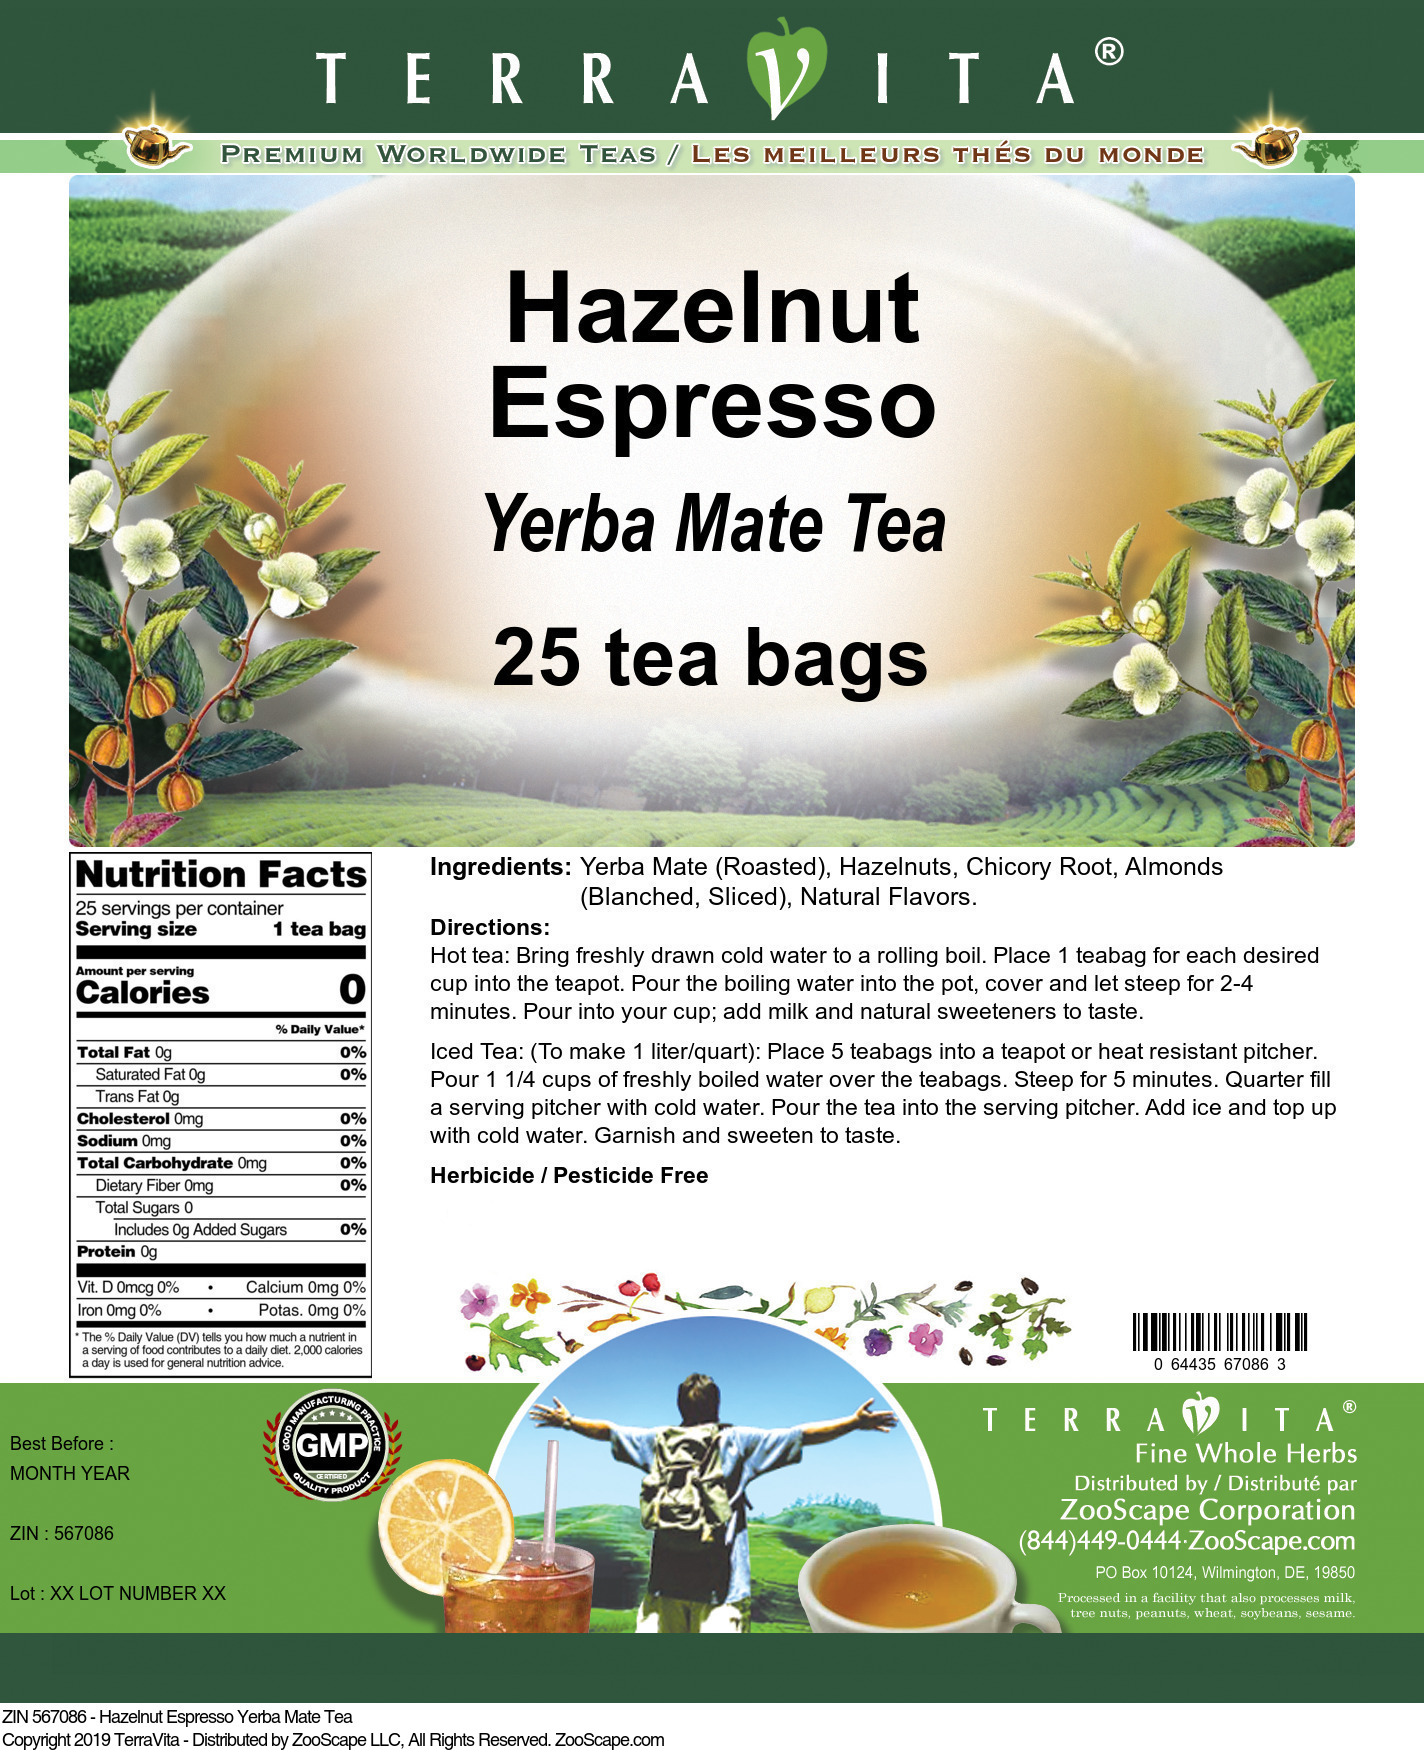 Hazelnut Espresso Yerba Mate Tea